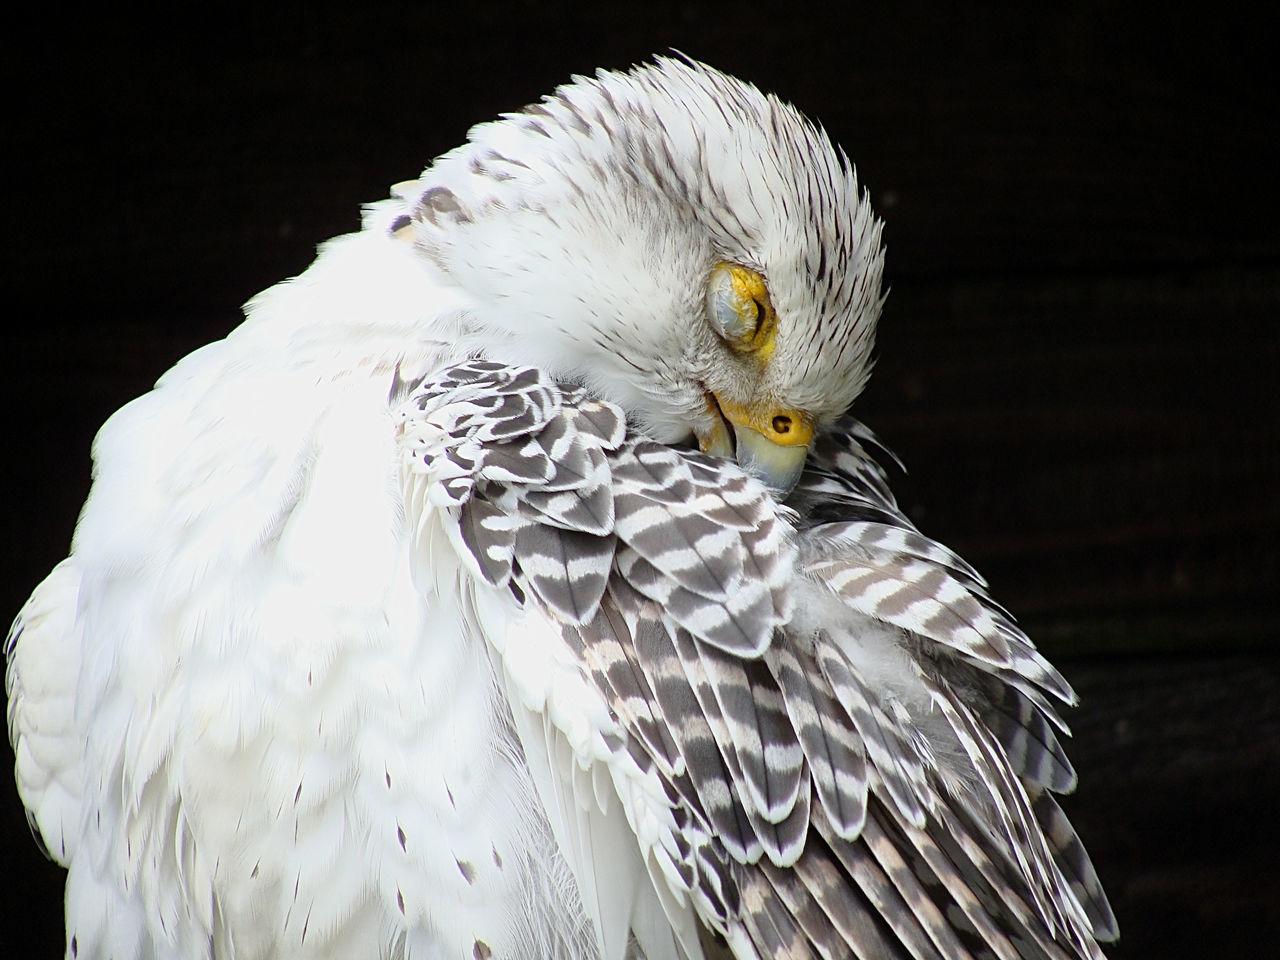 Animal Photography Animal Portrait Animal Themes Animal Wildlife Bird Bird Of Prey Birds Close-up No People One Animal